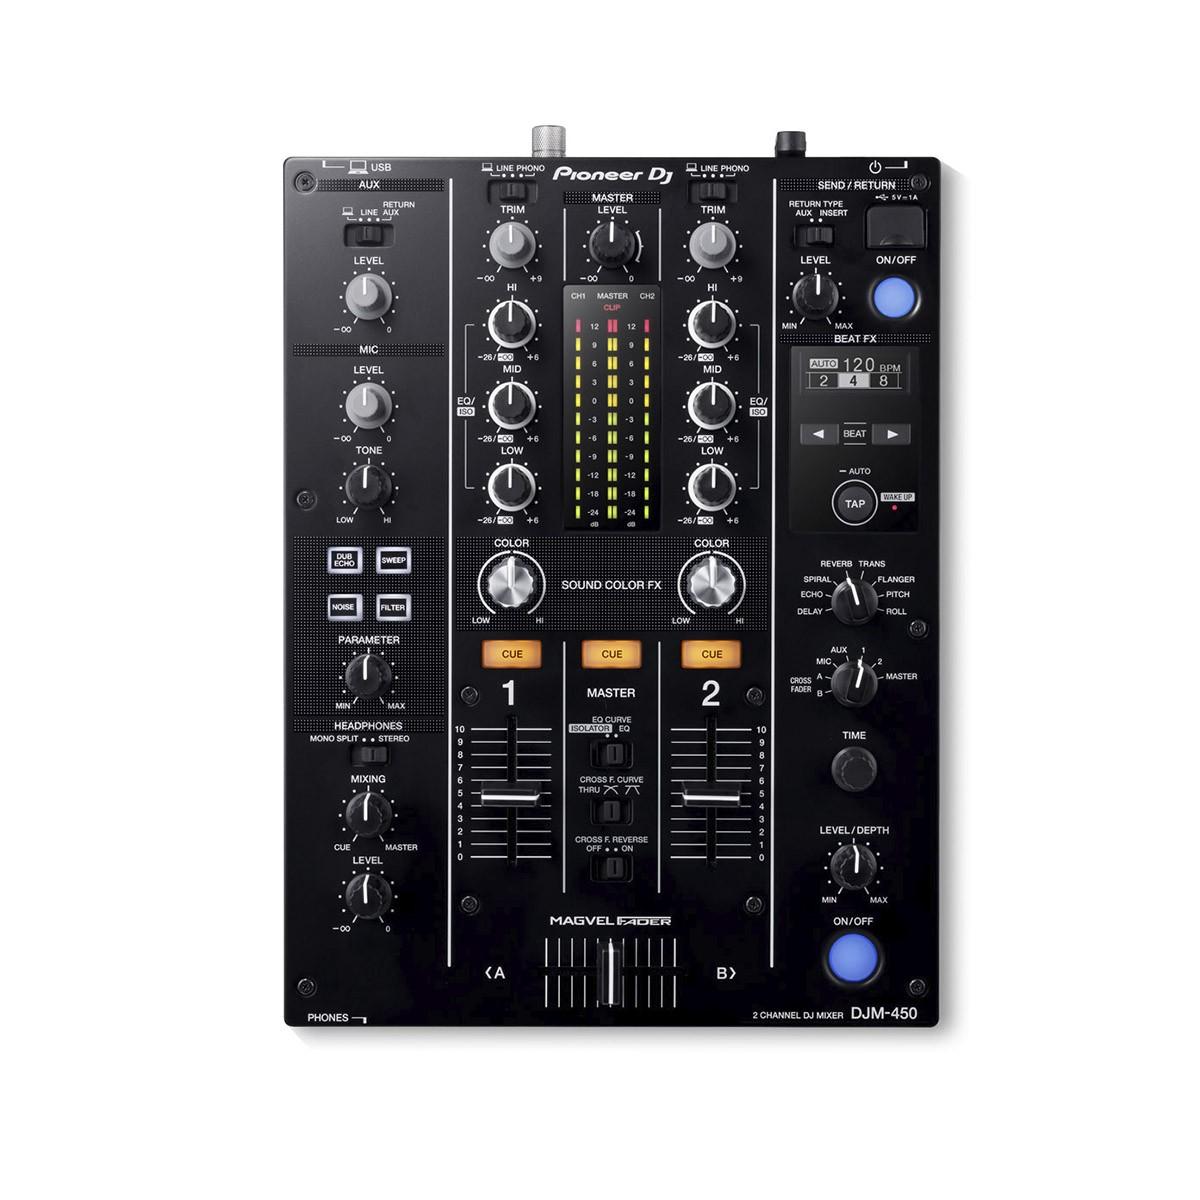 Mixer Pioneer DJ DJM 450